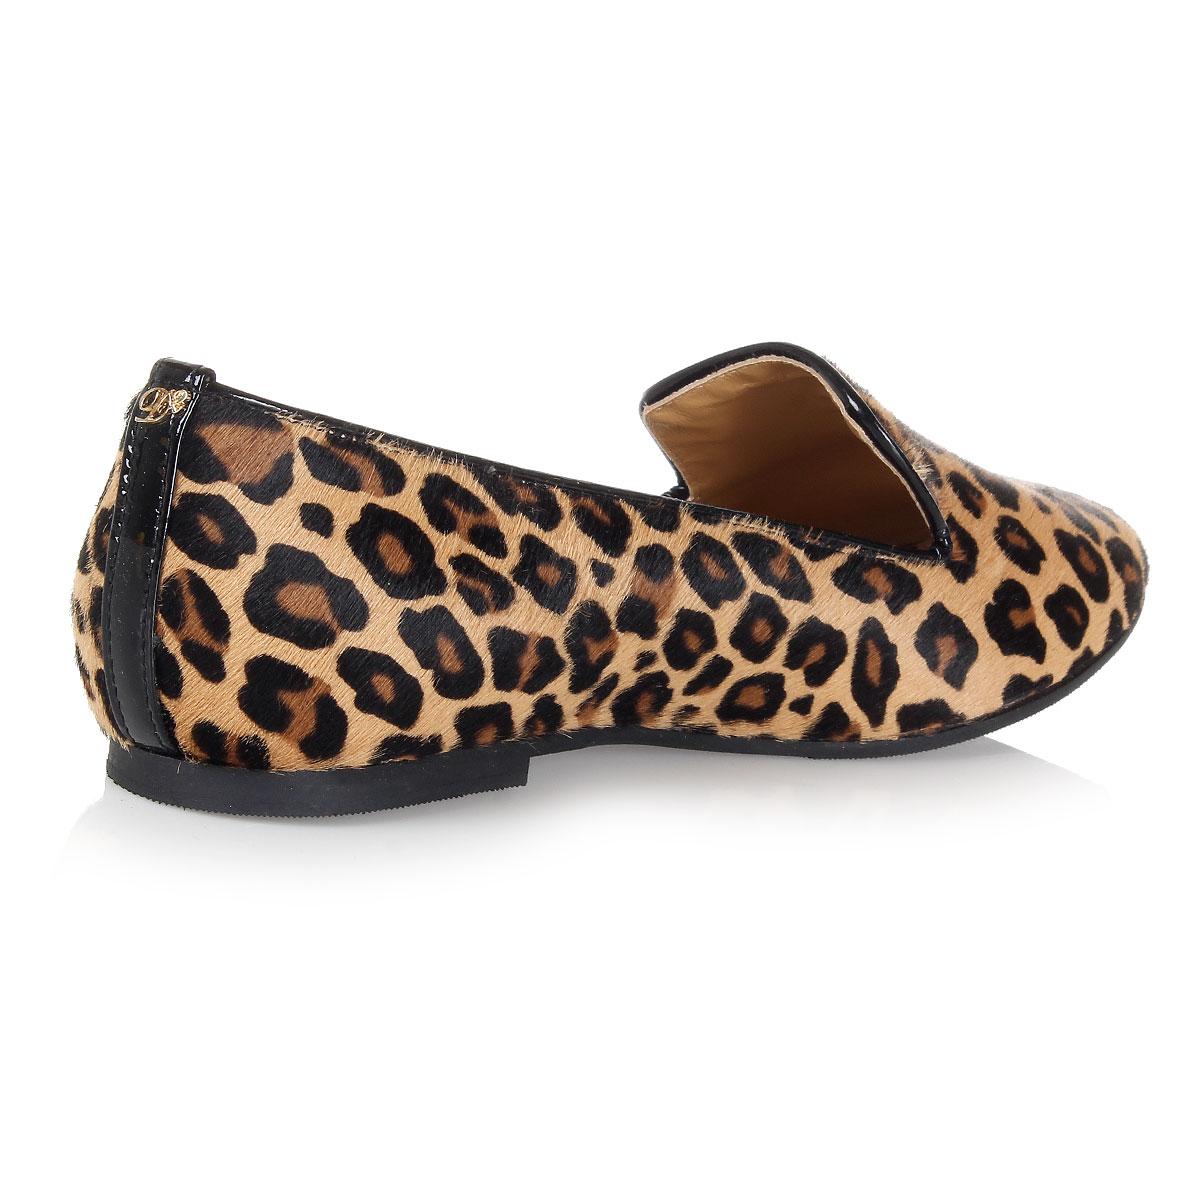 dsquared2 leopard print ponyskin flat shoes spence